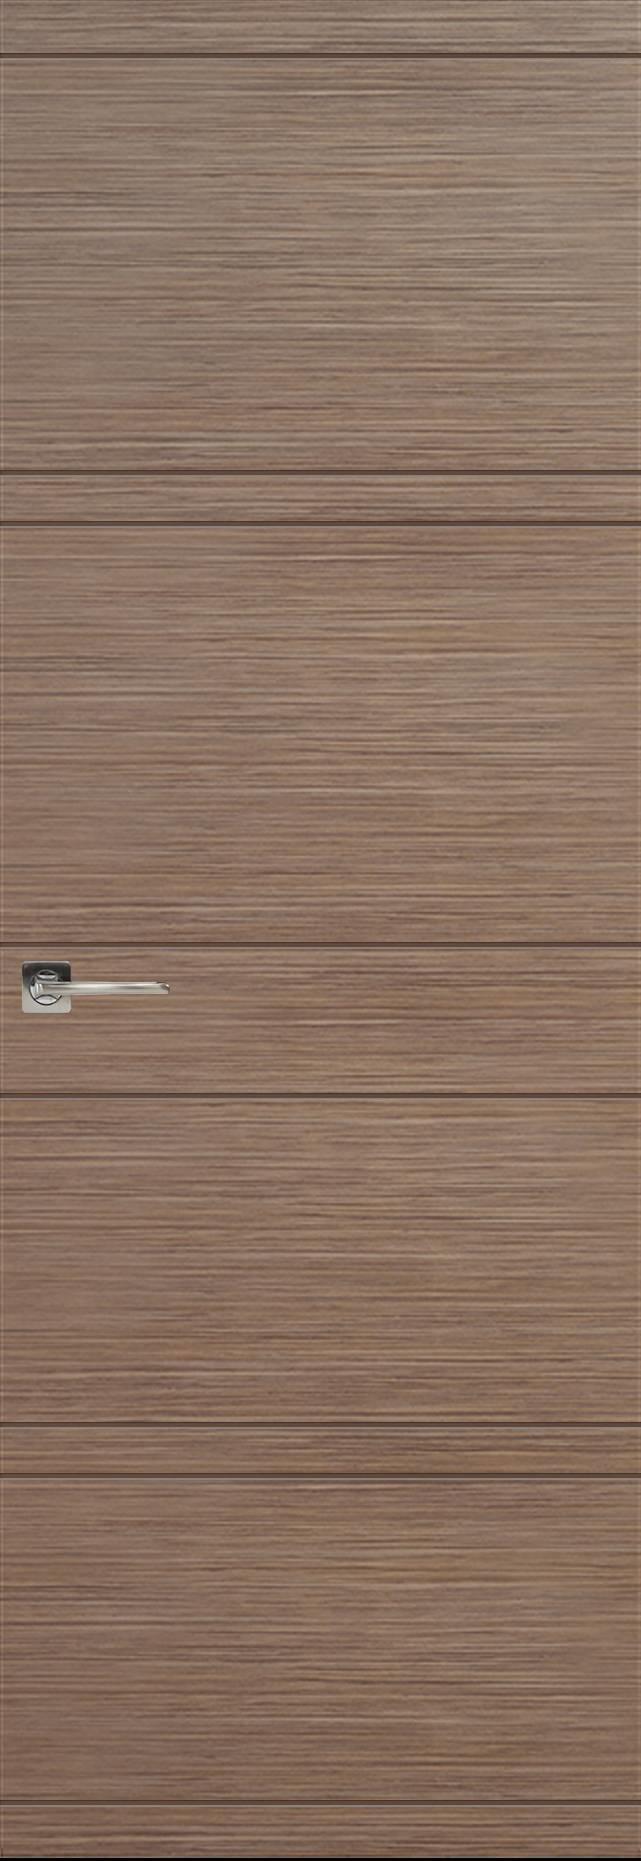 Tivoli Е-2 Невидимка цвет - Орех Без стекла (ДГ)